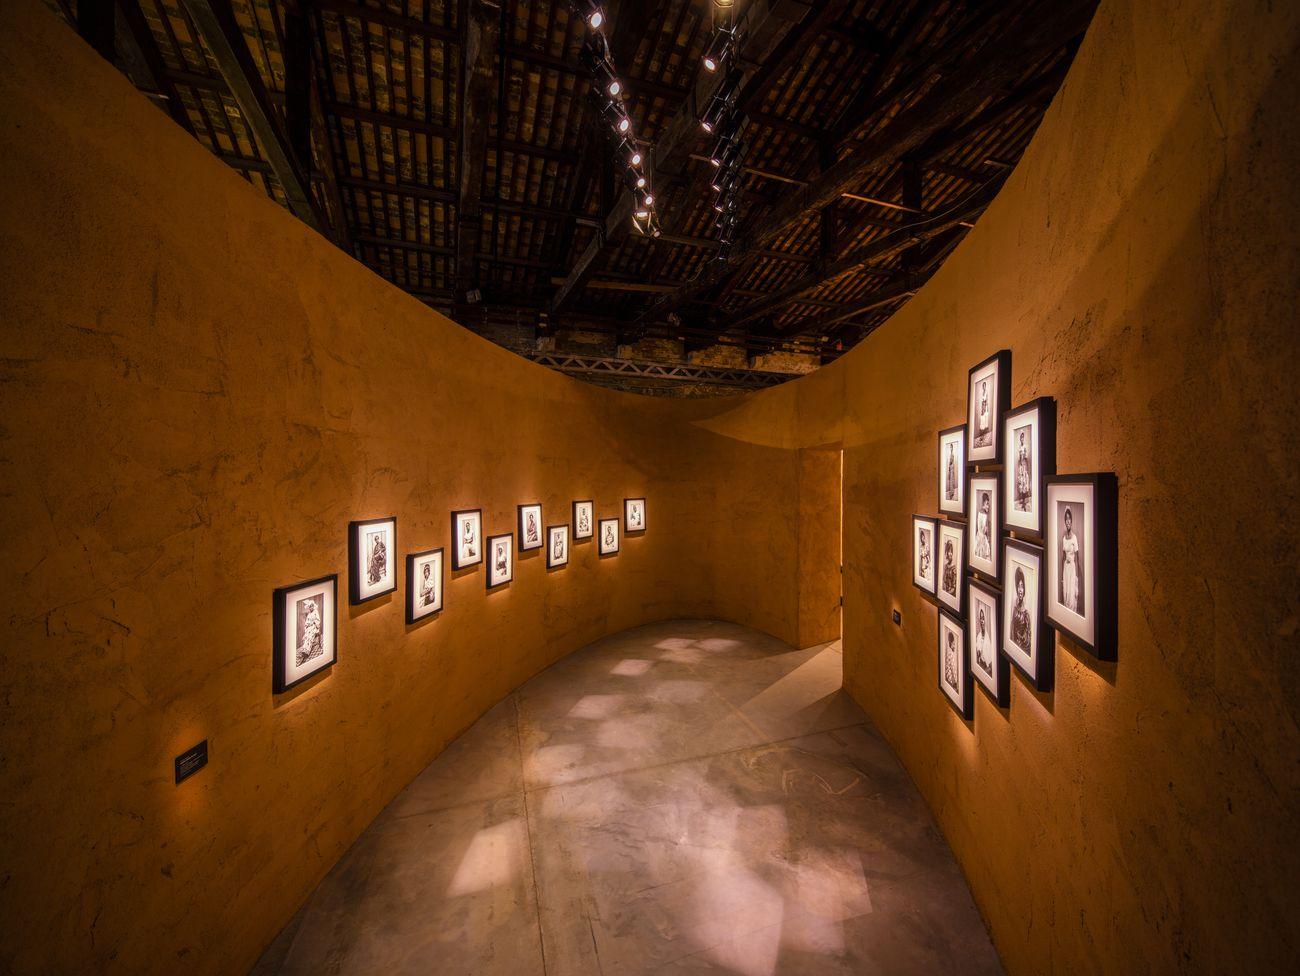 58-Biennale-di-Venezia-Padiglione-Ghana.-Felicia-Abban-Untitled-Portraits-and-Self-Portraits-anni-60-70-ca.-Courtesy-the-artist.-Photo-David-Levene